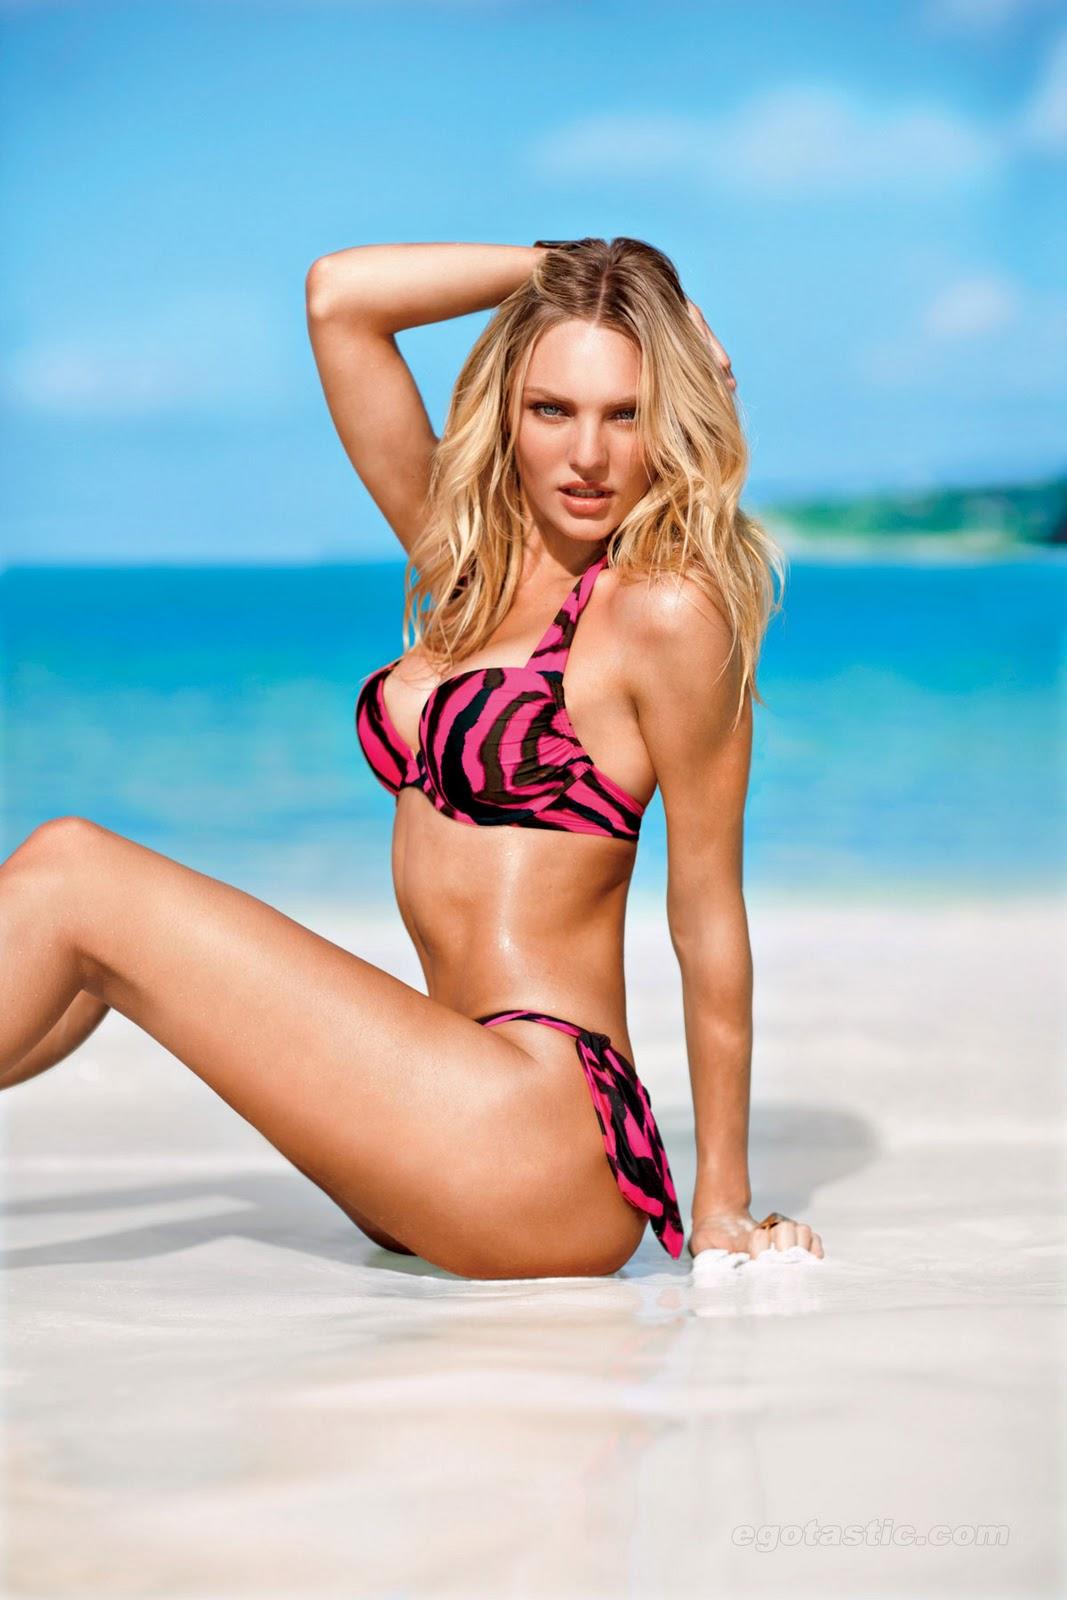 http://2.bp.blogspot.com/_775ESC4svi8/TS39O1-2RtI/AAAAAAAABS0/5vx-HJEUP2Q/s1600/candice-swanepoel-victorias-secret-swim-catalog-06.jpg